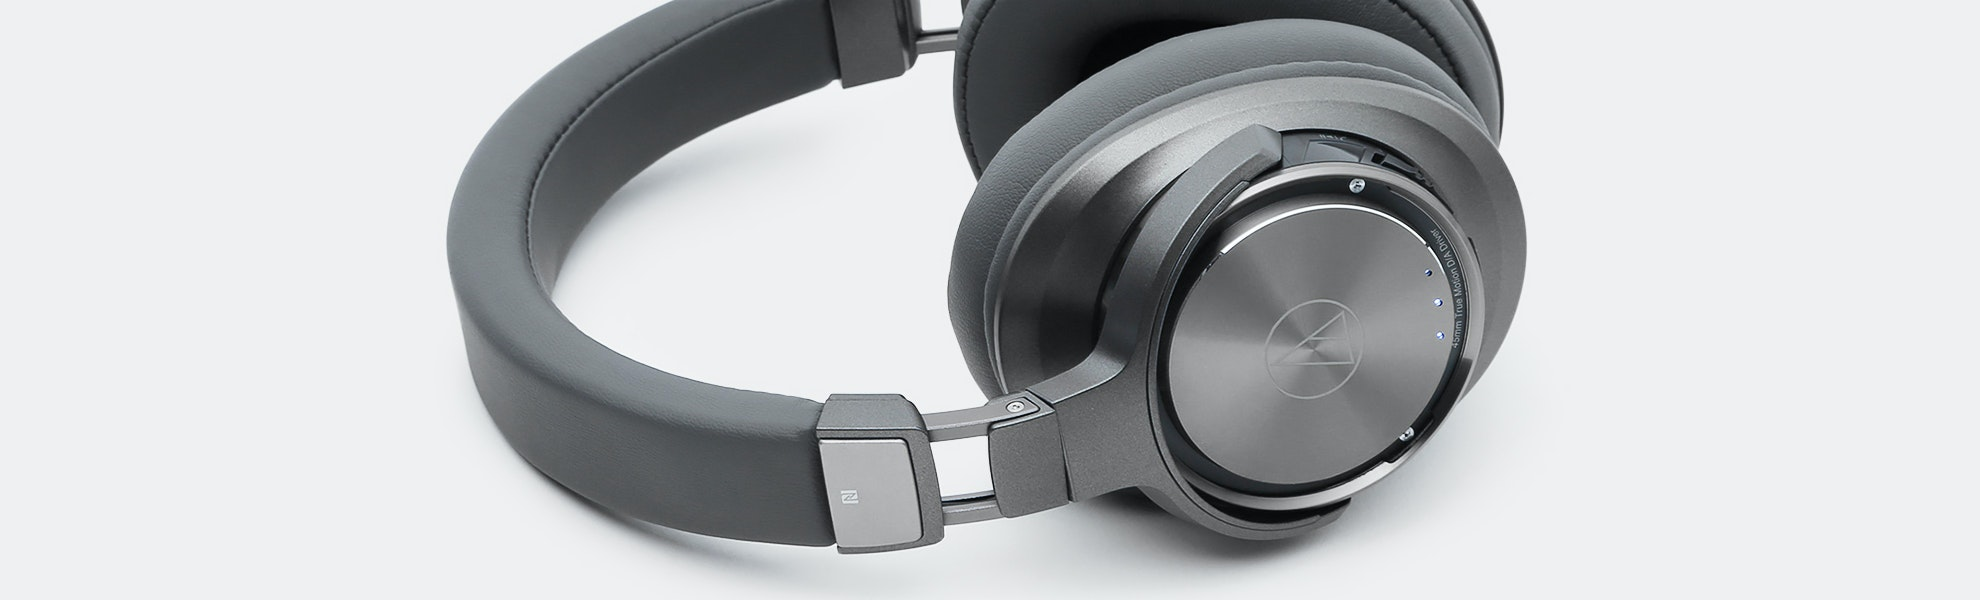 Audio-Technica ATH-DSR9BT Bluetooth Headphones